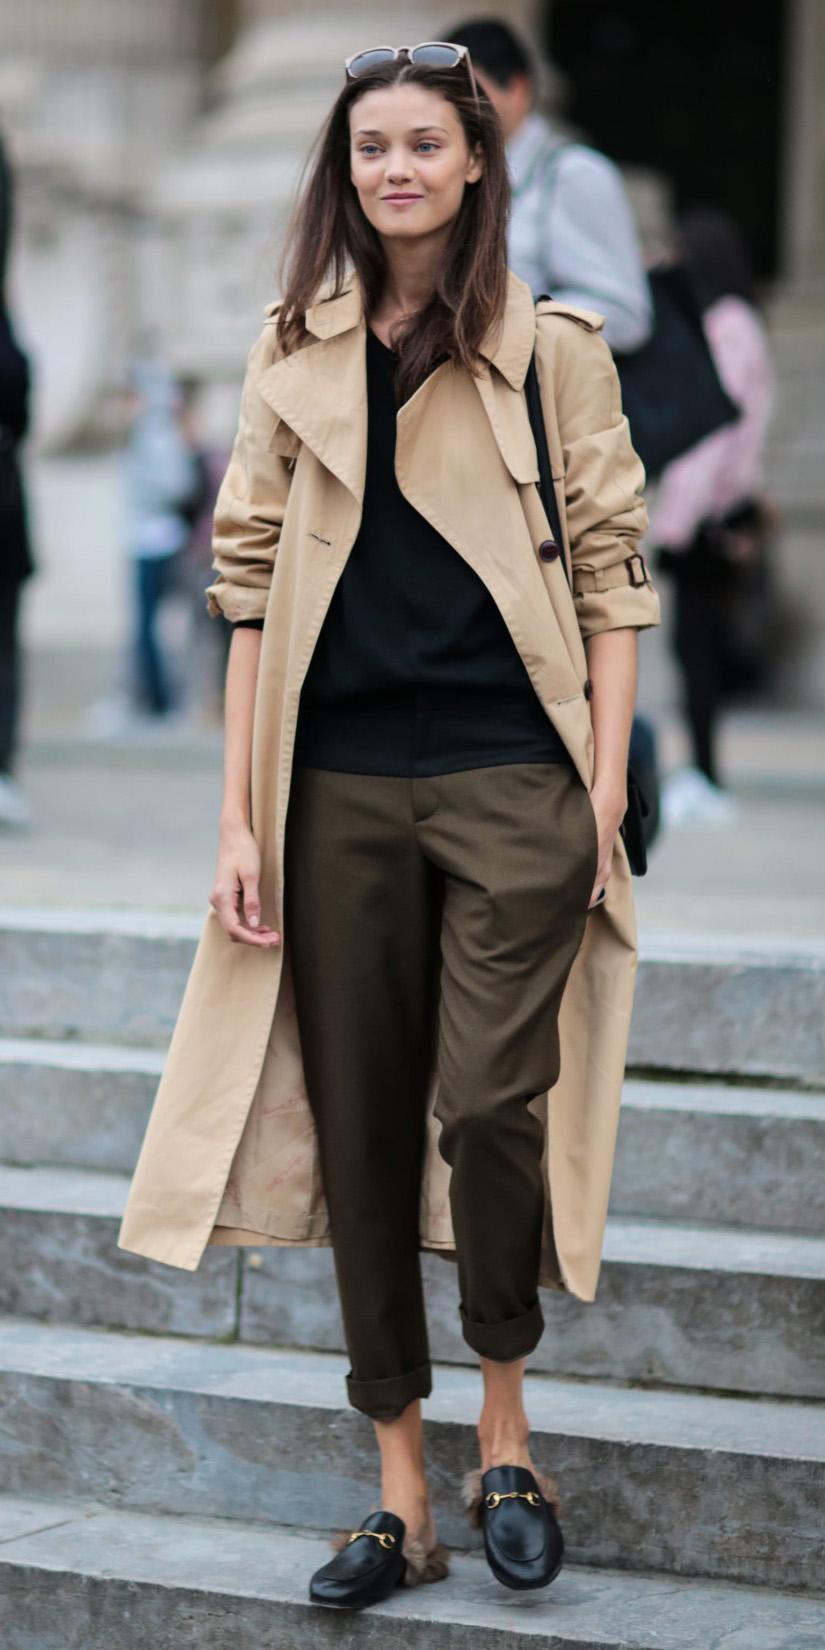 green-olive-joggers-pants-black-tee-brun-black-shoe-loafers-tan-jacket-coat-trench-fall-winter-weekend.jpg